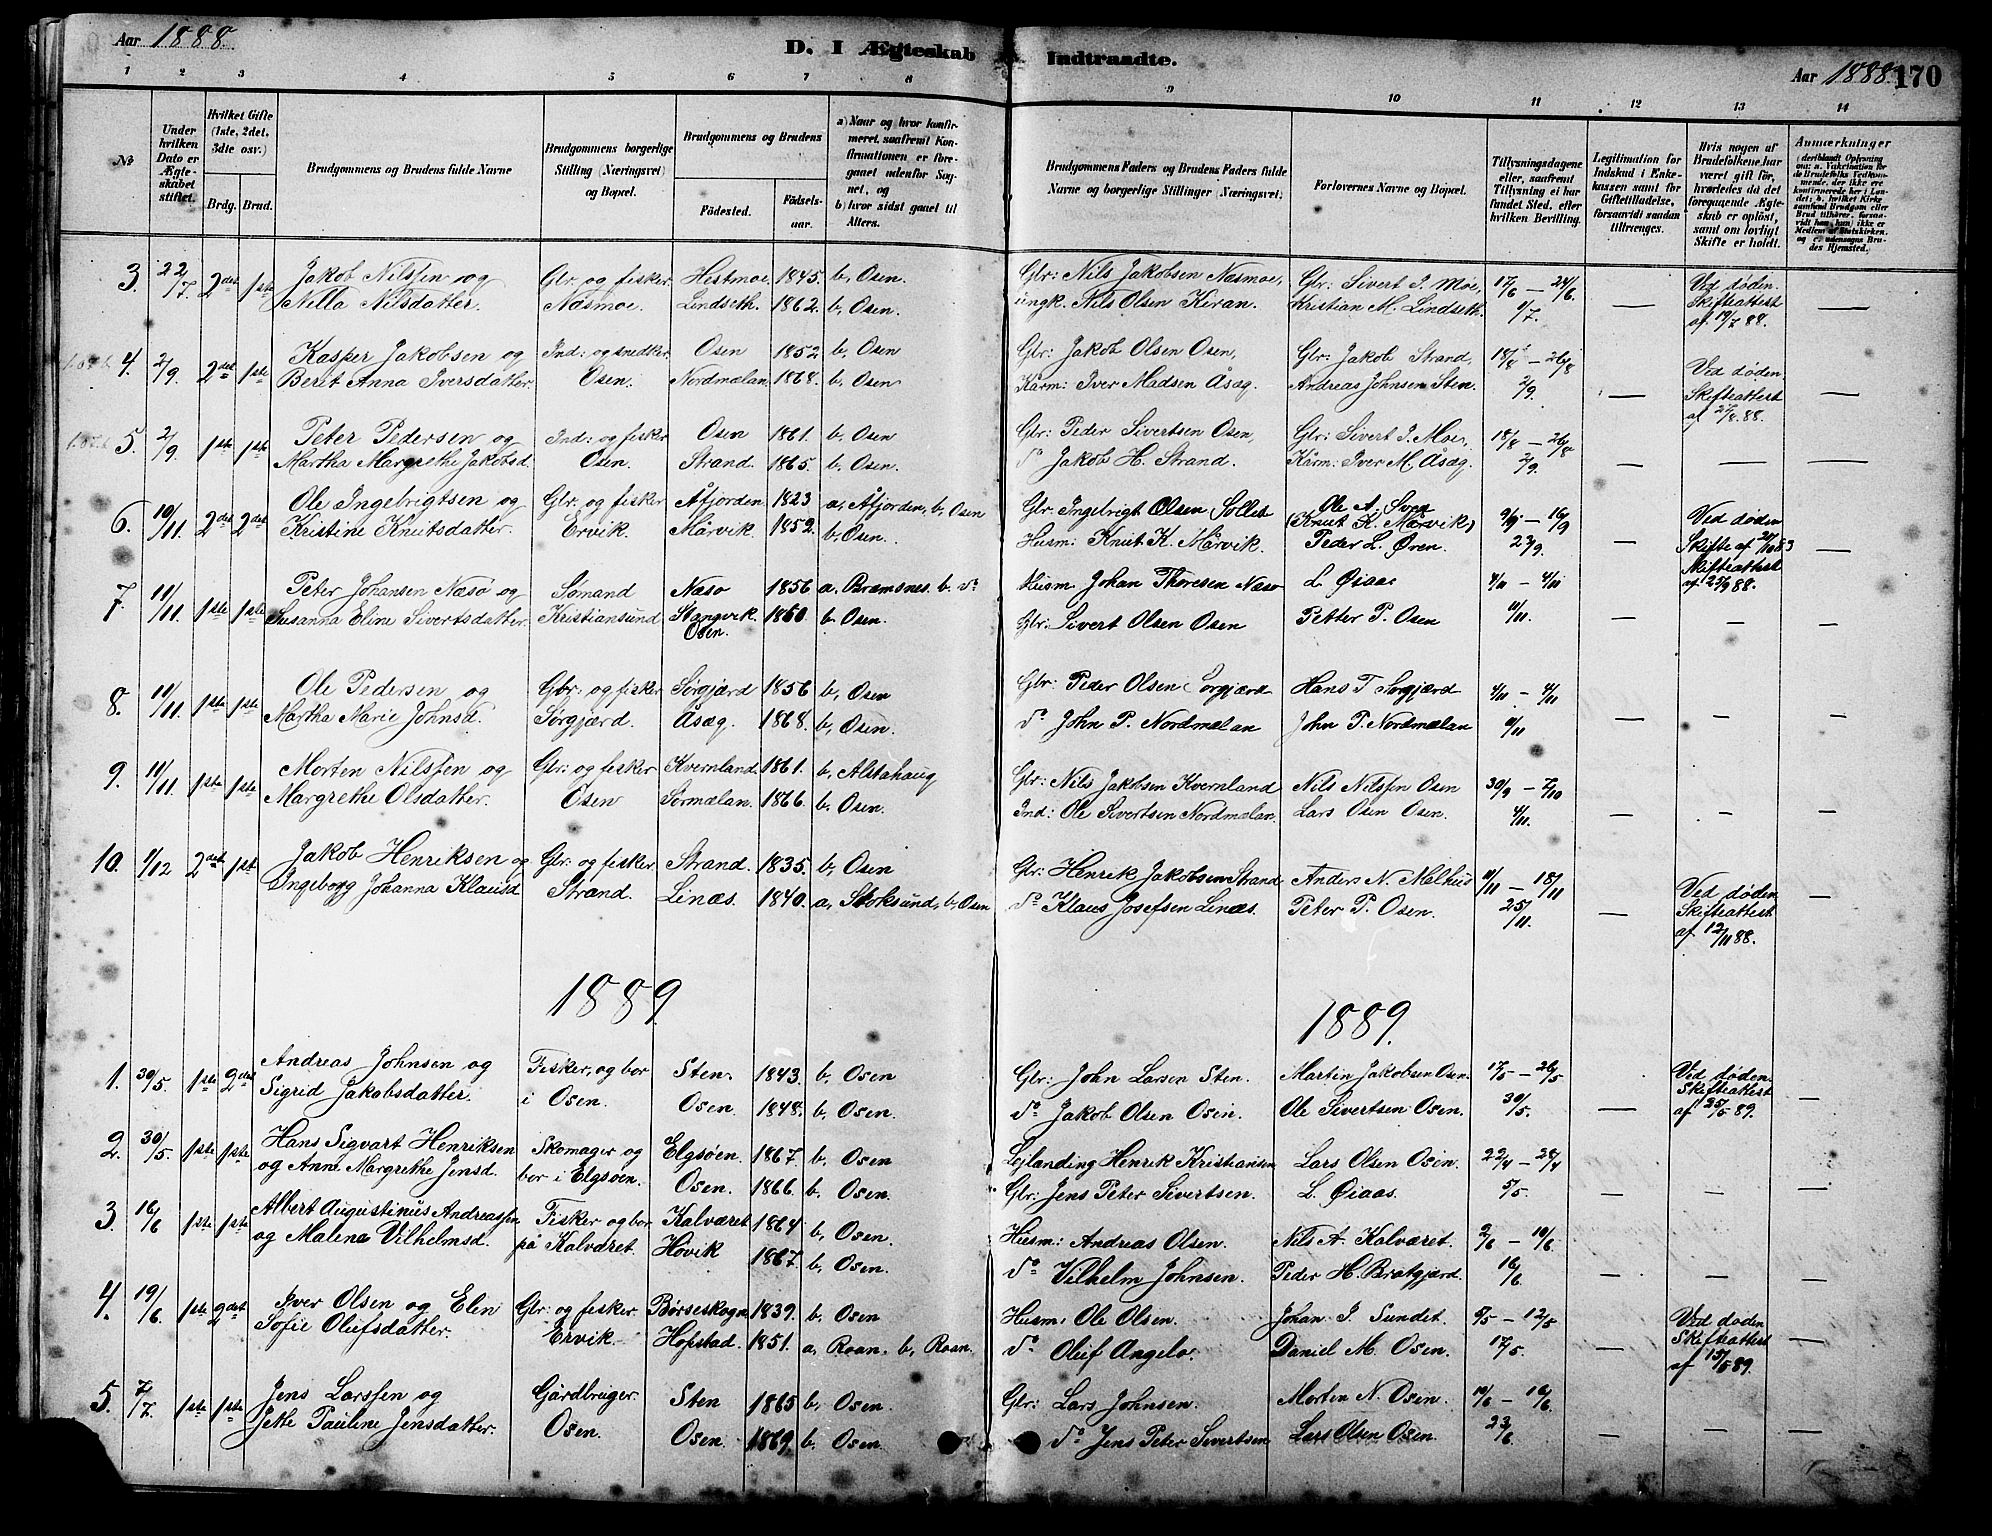 SAT, Ministerialprotokoller, klokkerbøker og fødselsregistre - Sør-Trøndelag, 658/L0726: Parish register (copy) no. 658C02, 1883-1908, p. 170